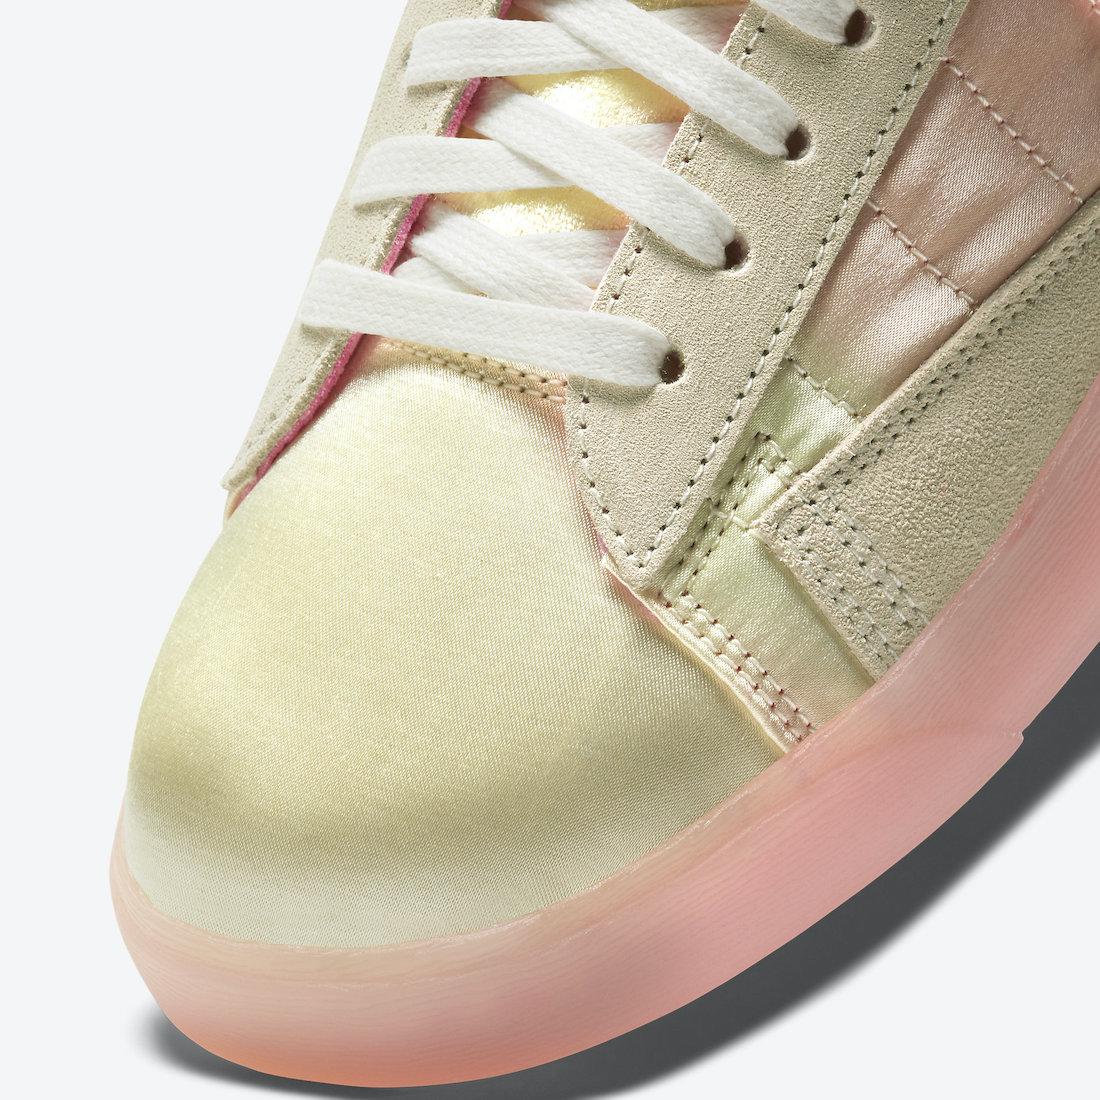 Nike,Blazer Mid,Rebel,Spring F 国外鞋迷馋哭了!CNY 配色 Blazer Mid 明天正式发售!